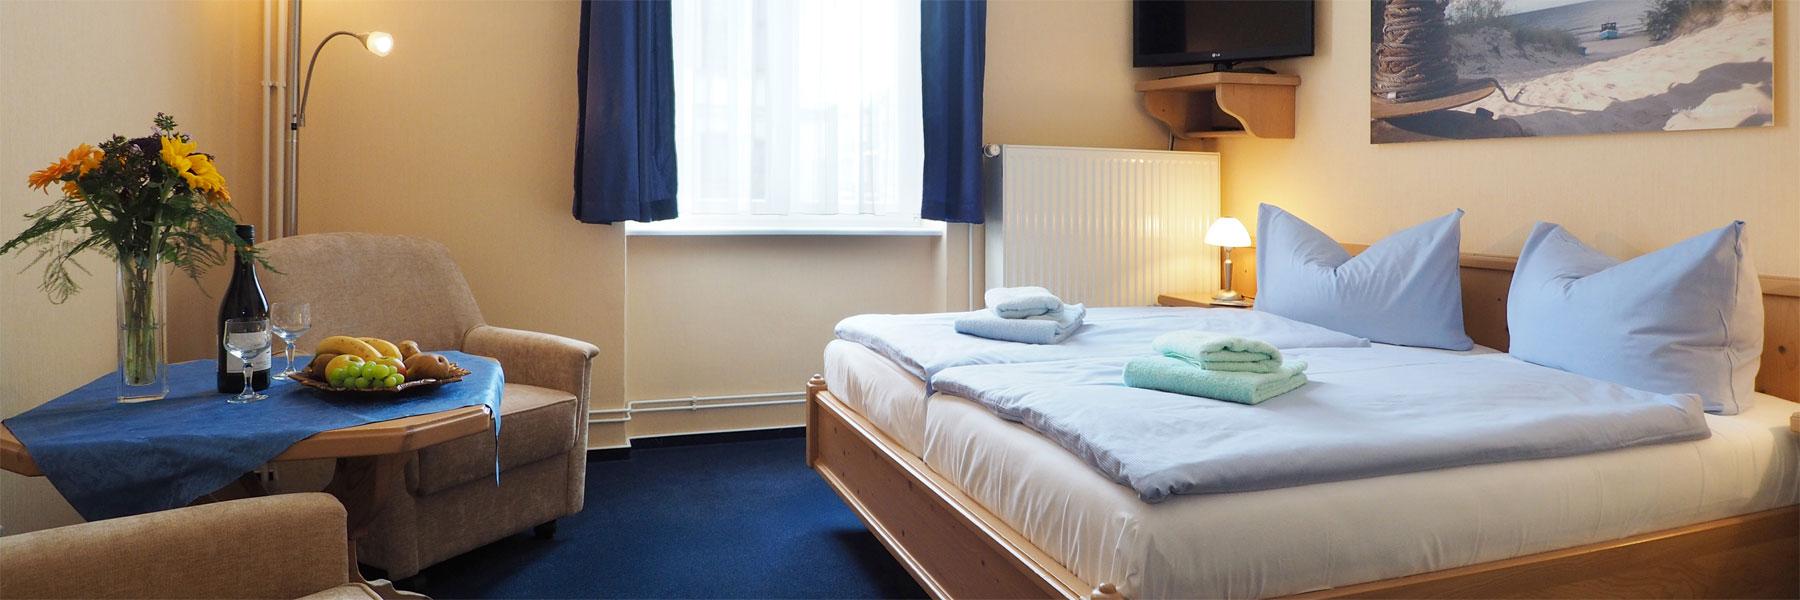 Doppelzimmer - Pension Carlsburg